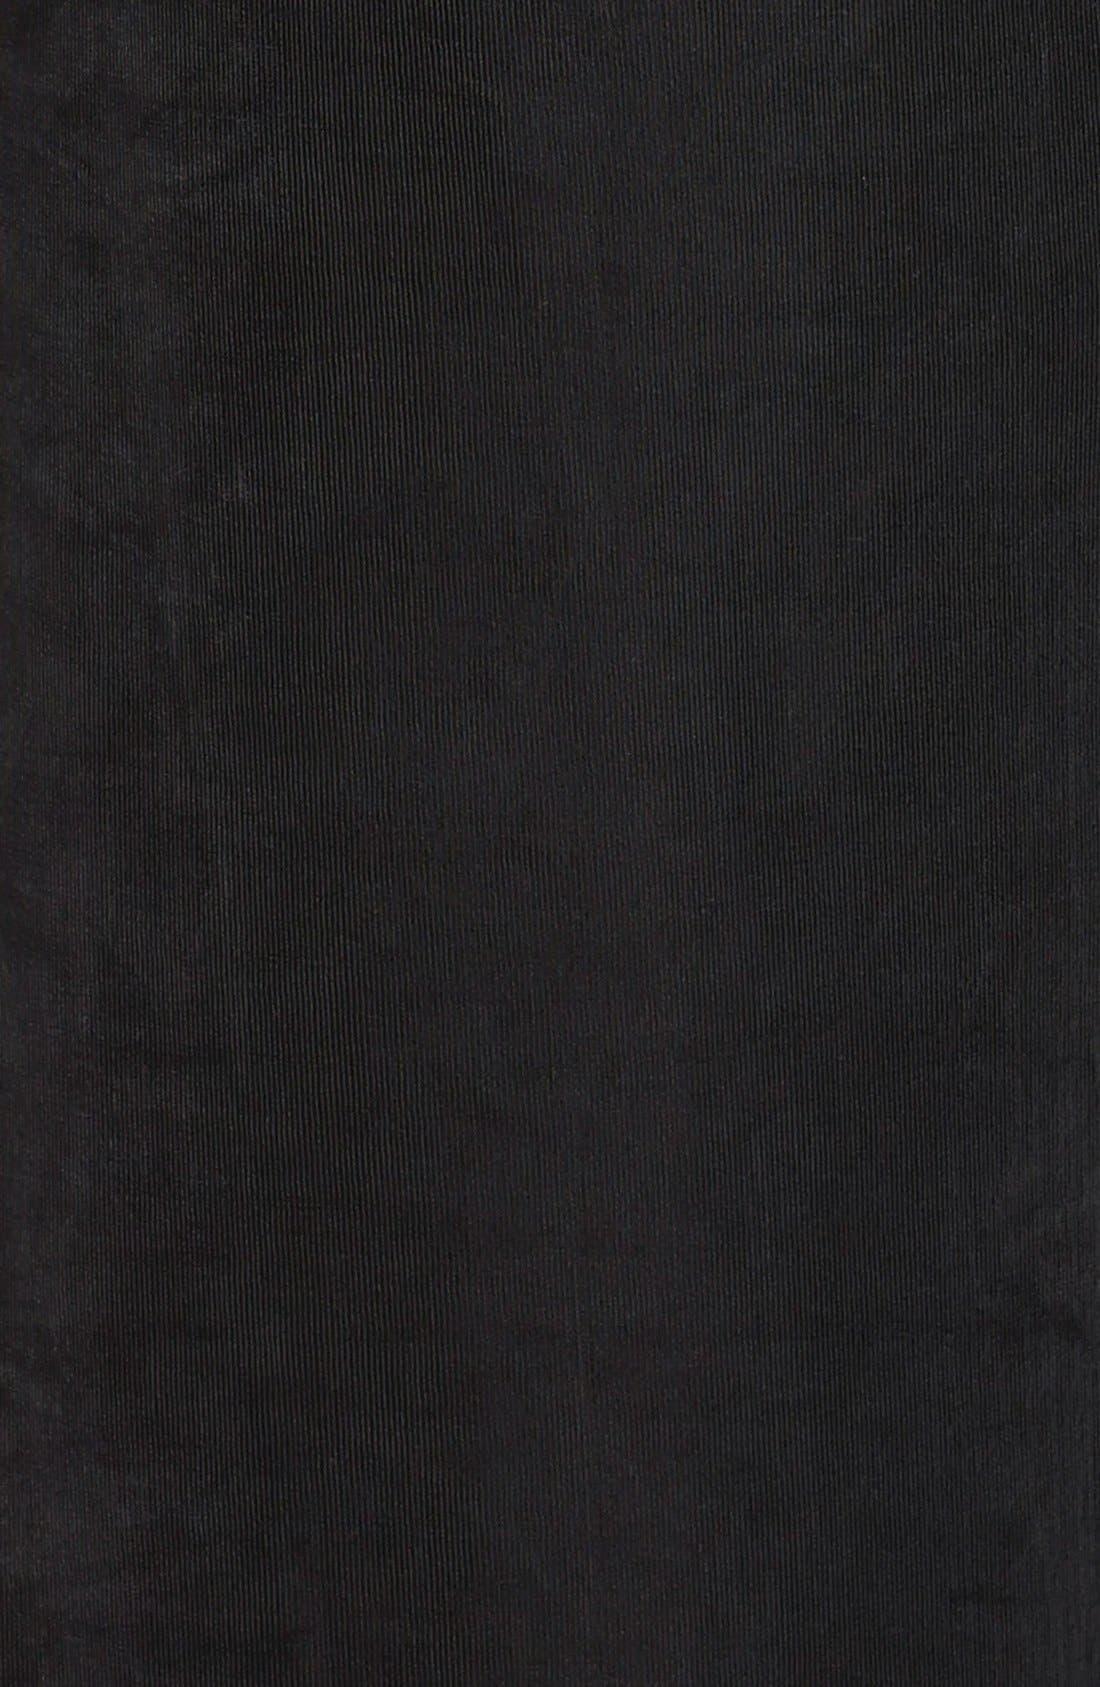 VIKKI VI, High Rise Stretch Knit Crop Pants, Alternate thumbnail 3, color, BLACK